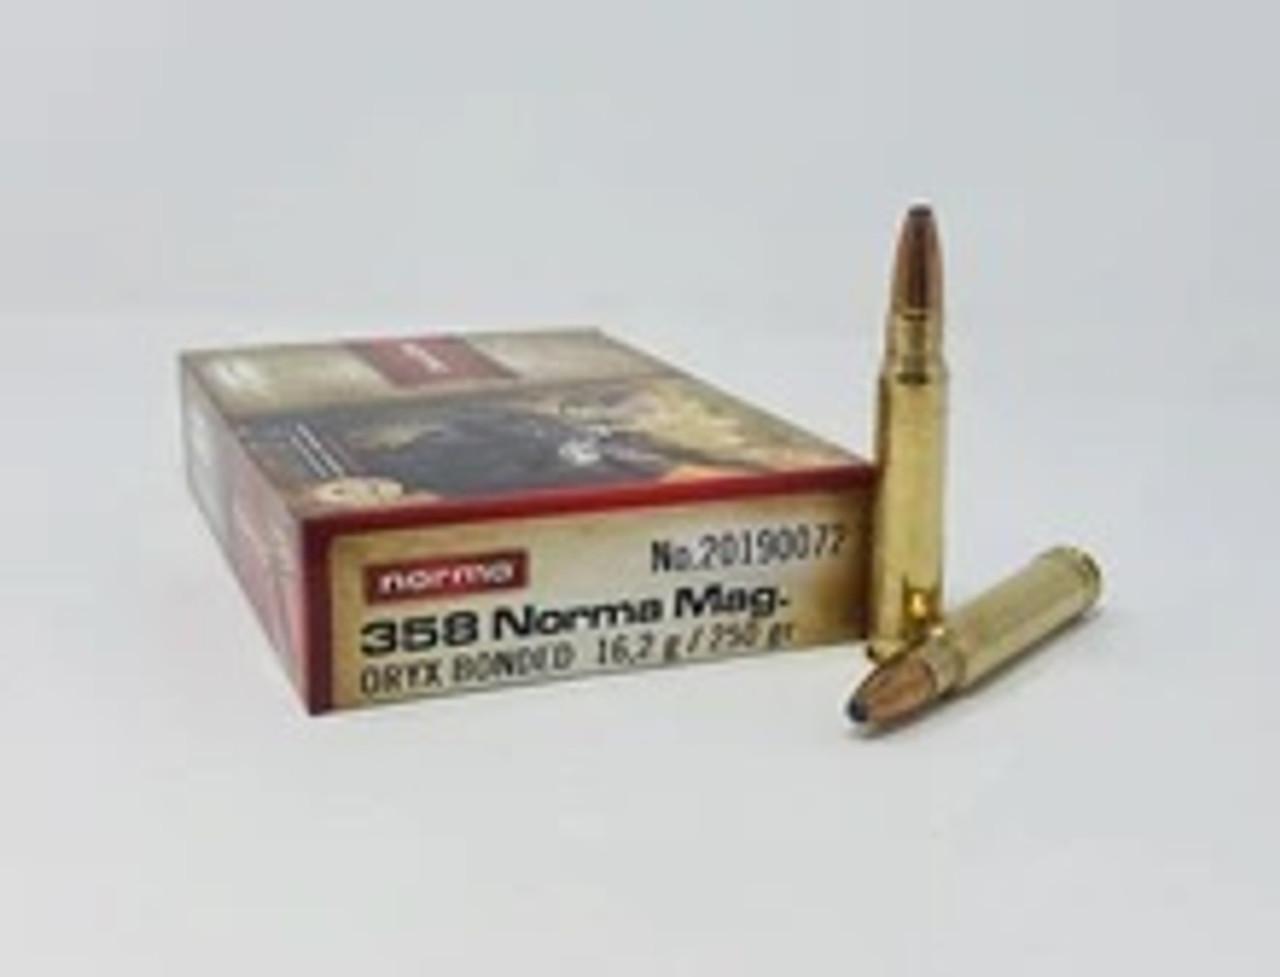 358 Norma Mag